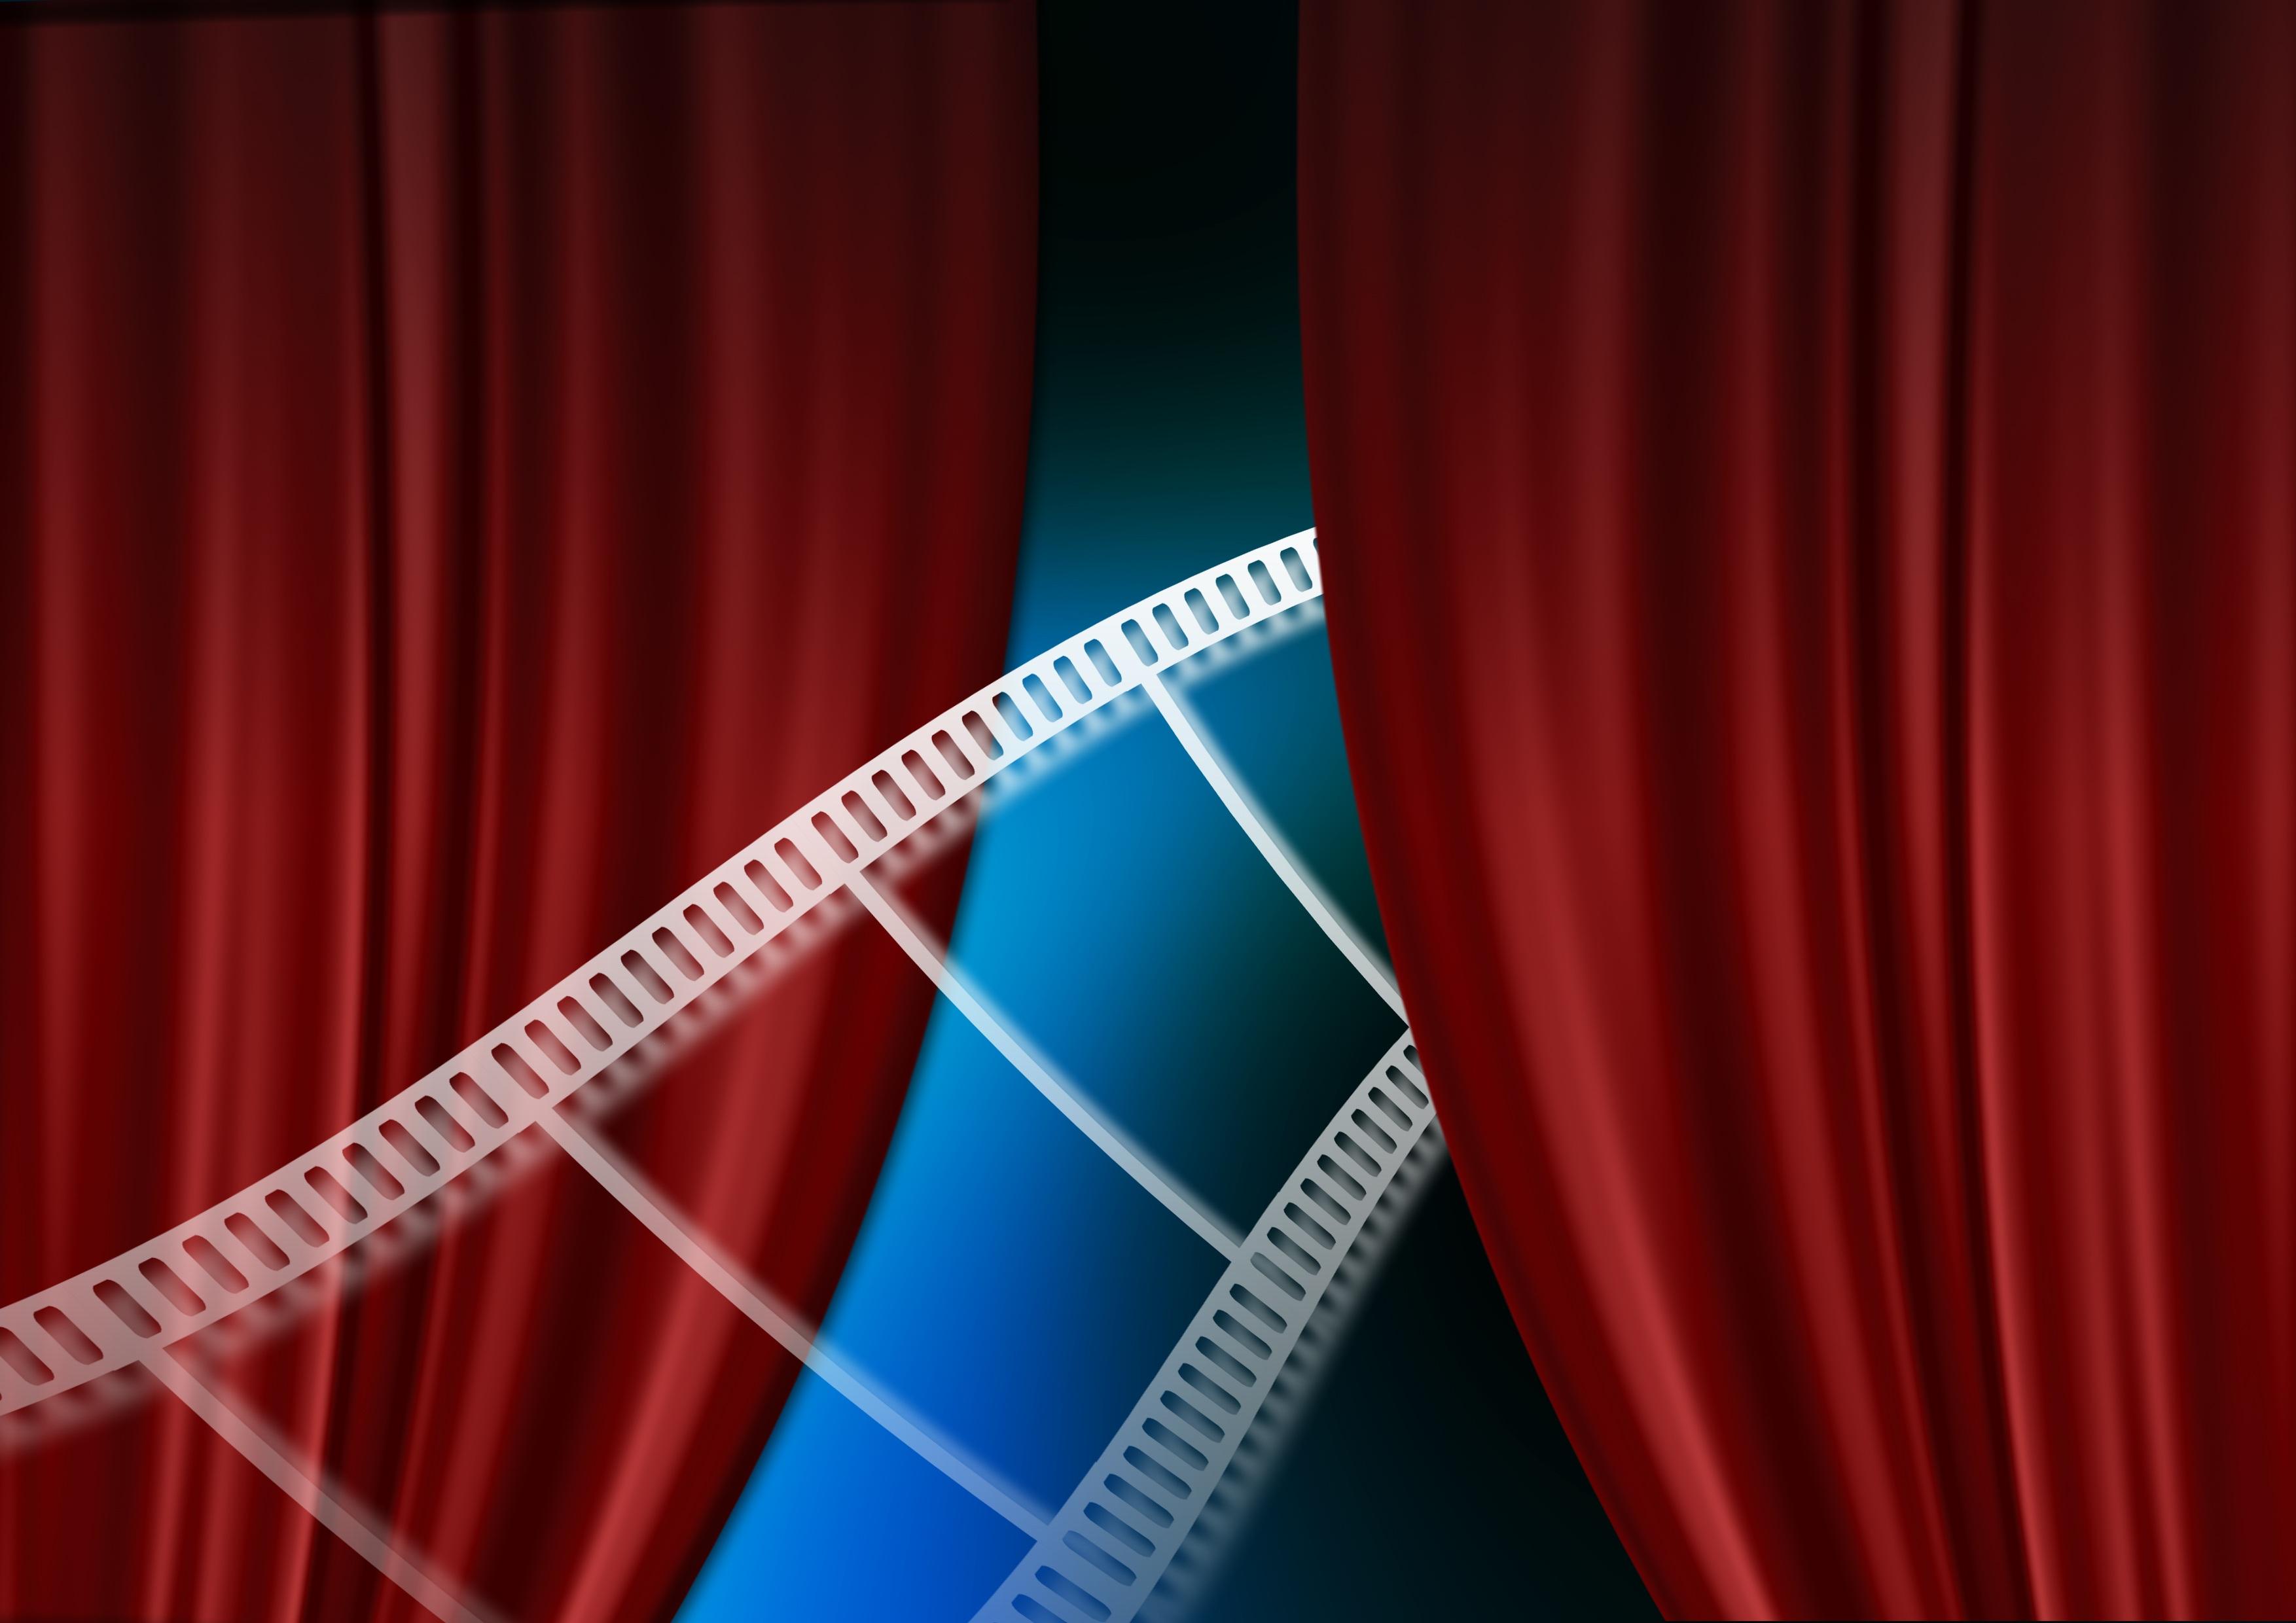 Cancer et cinéma